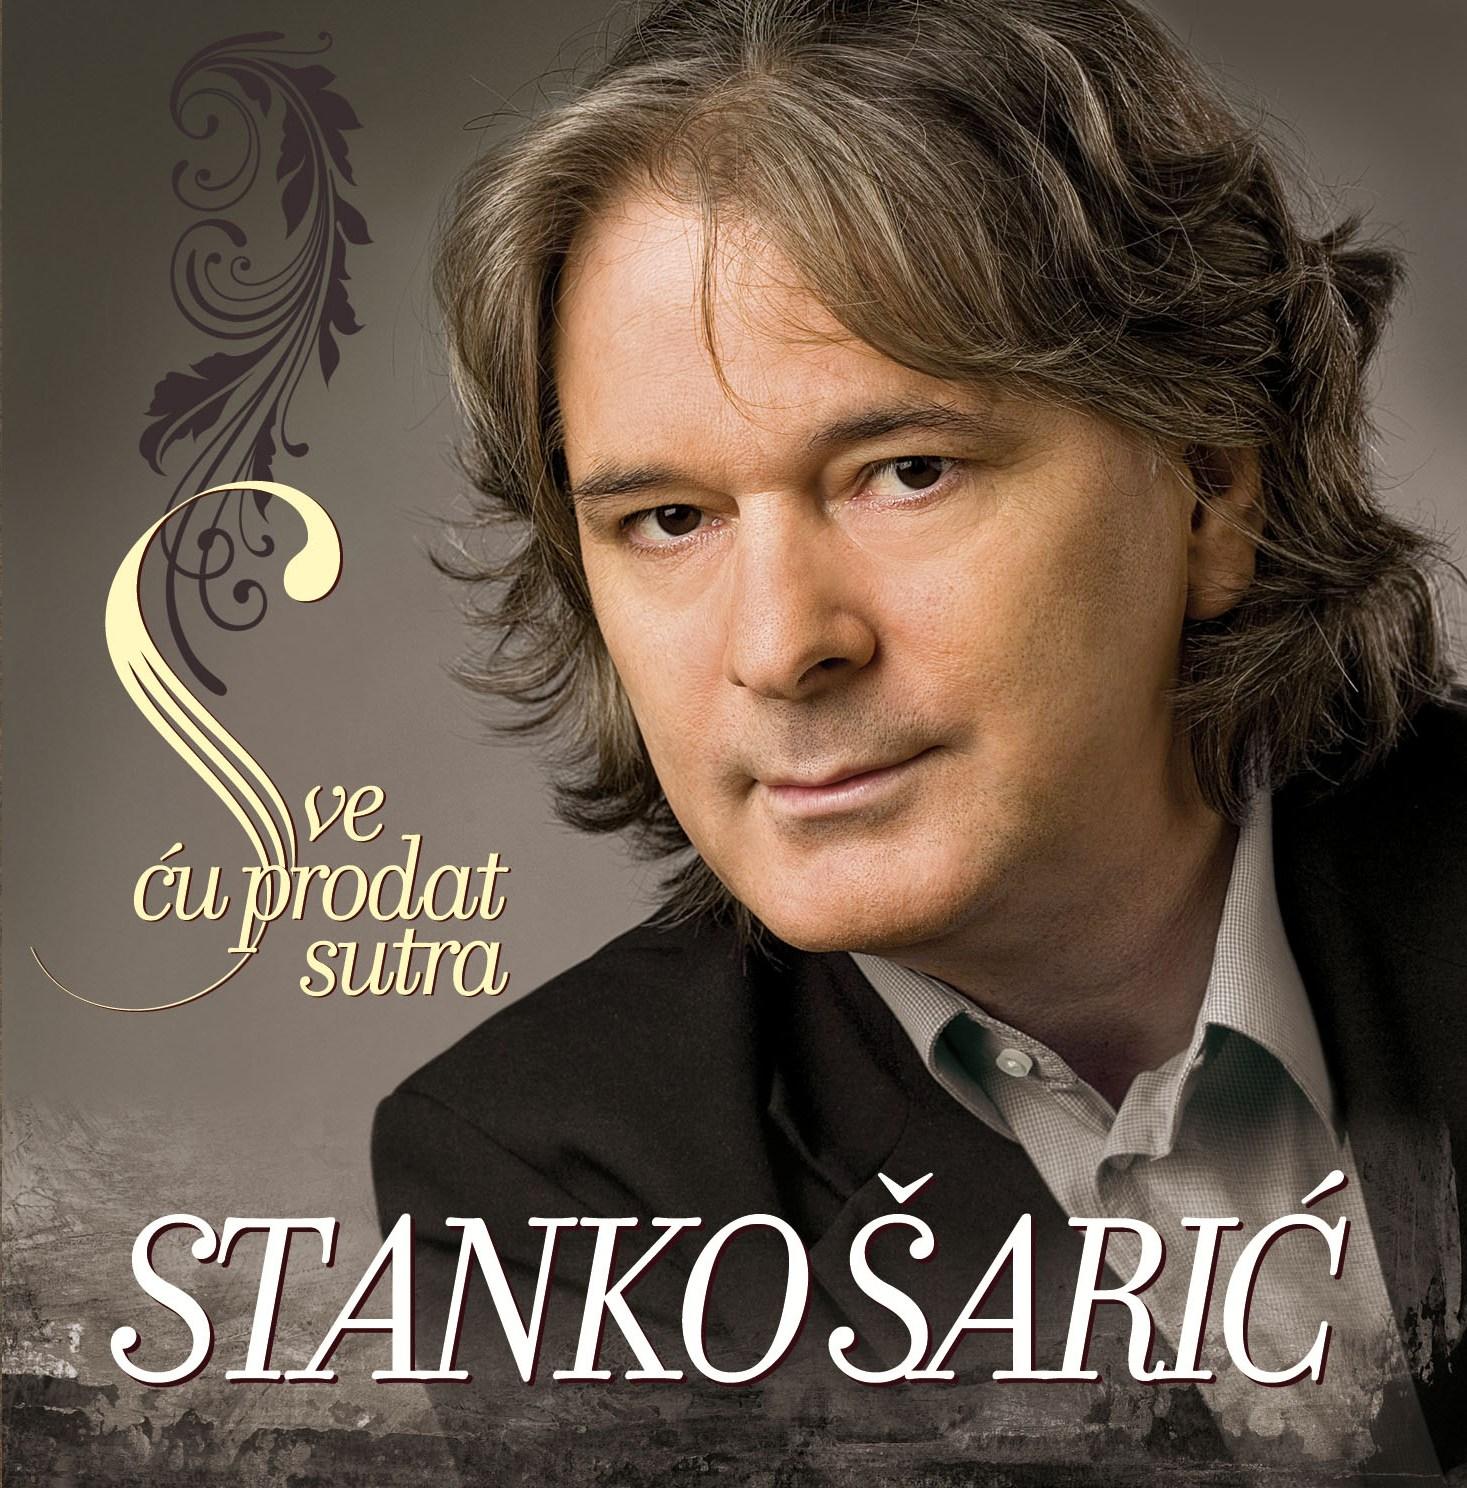 http://hrvatskifokus-2021.ga/wp-content/uploads/2016/08/SVE_CU_PRODAT_LICE.jpg